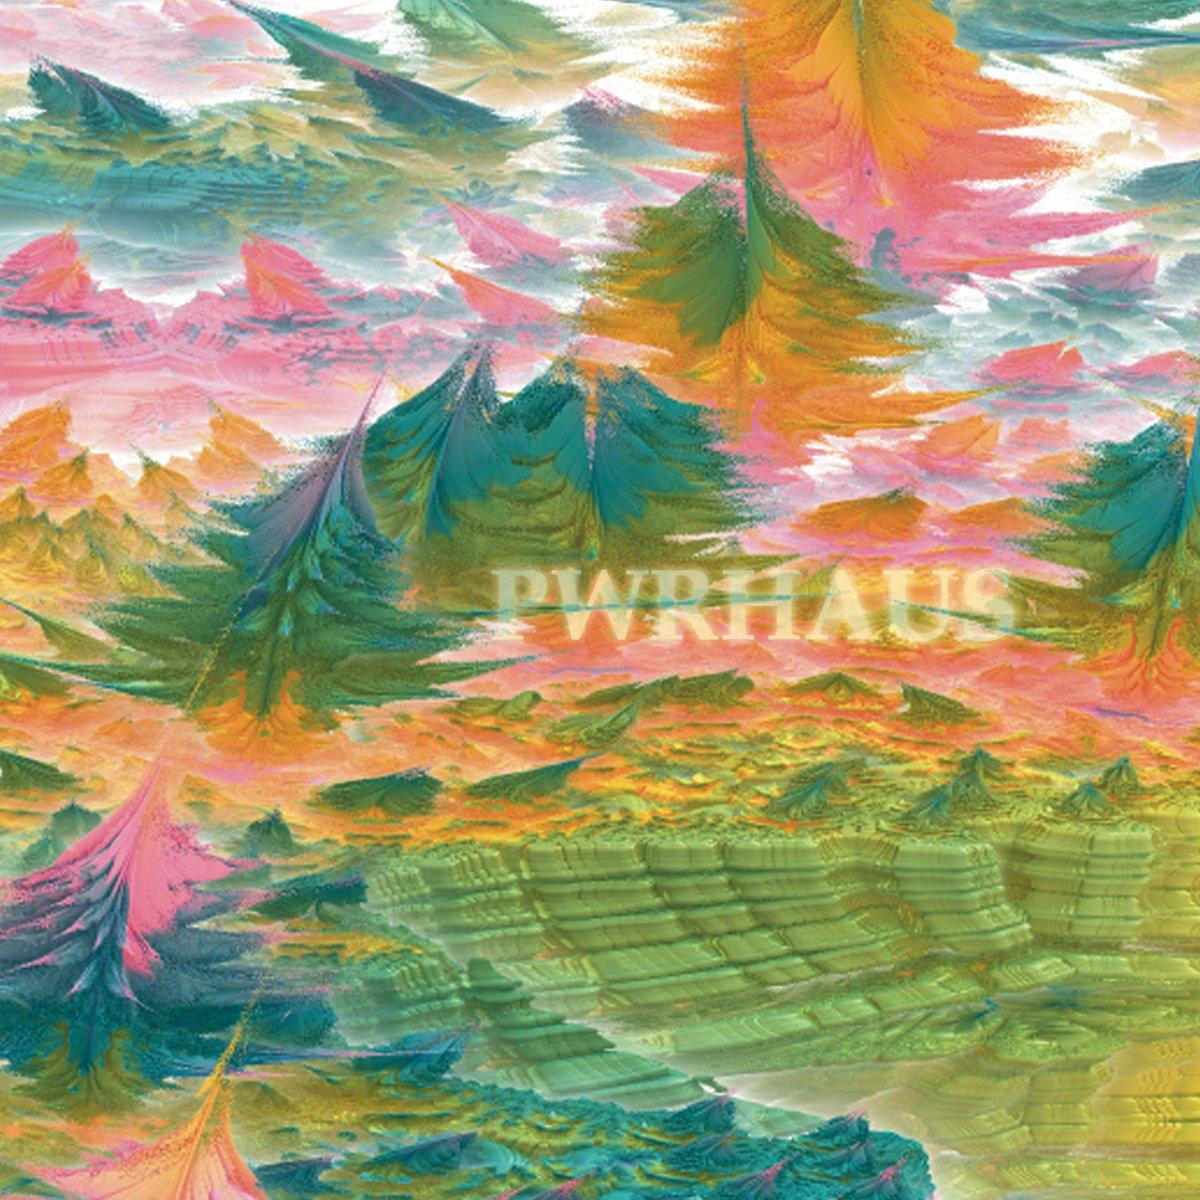 pwrhaus album